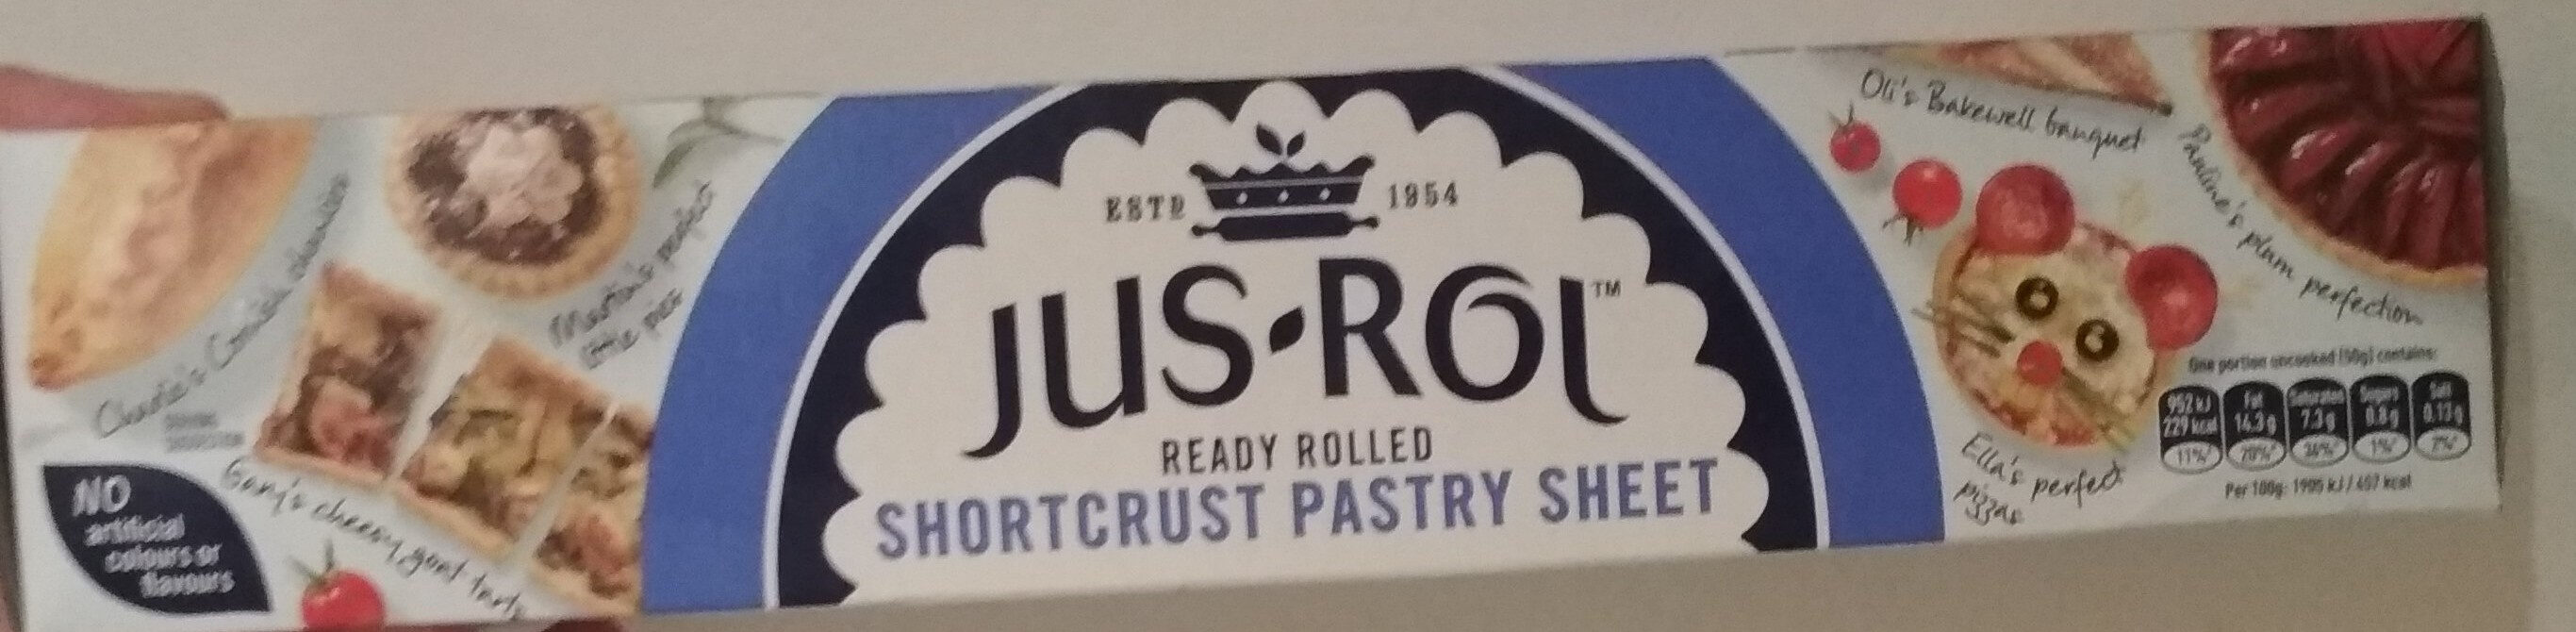 Jus Rol Shortcrust Pastry Ready Rolled - Producte - en